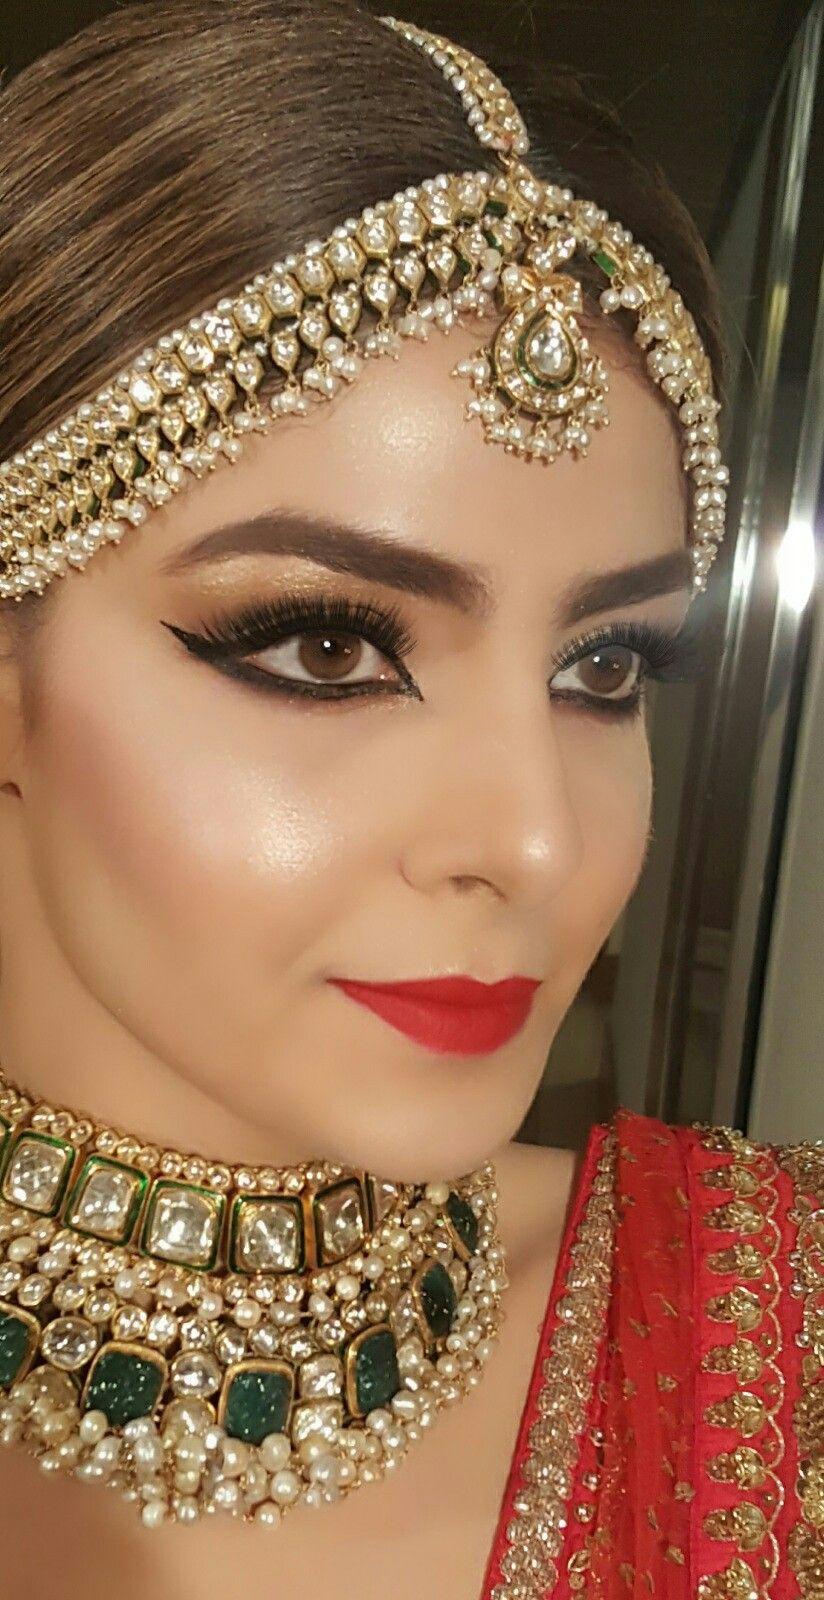 Fashion style beauty makeup indian bridal makeup